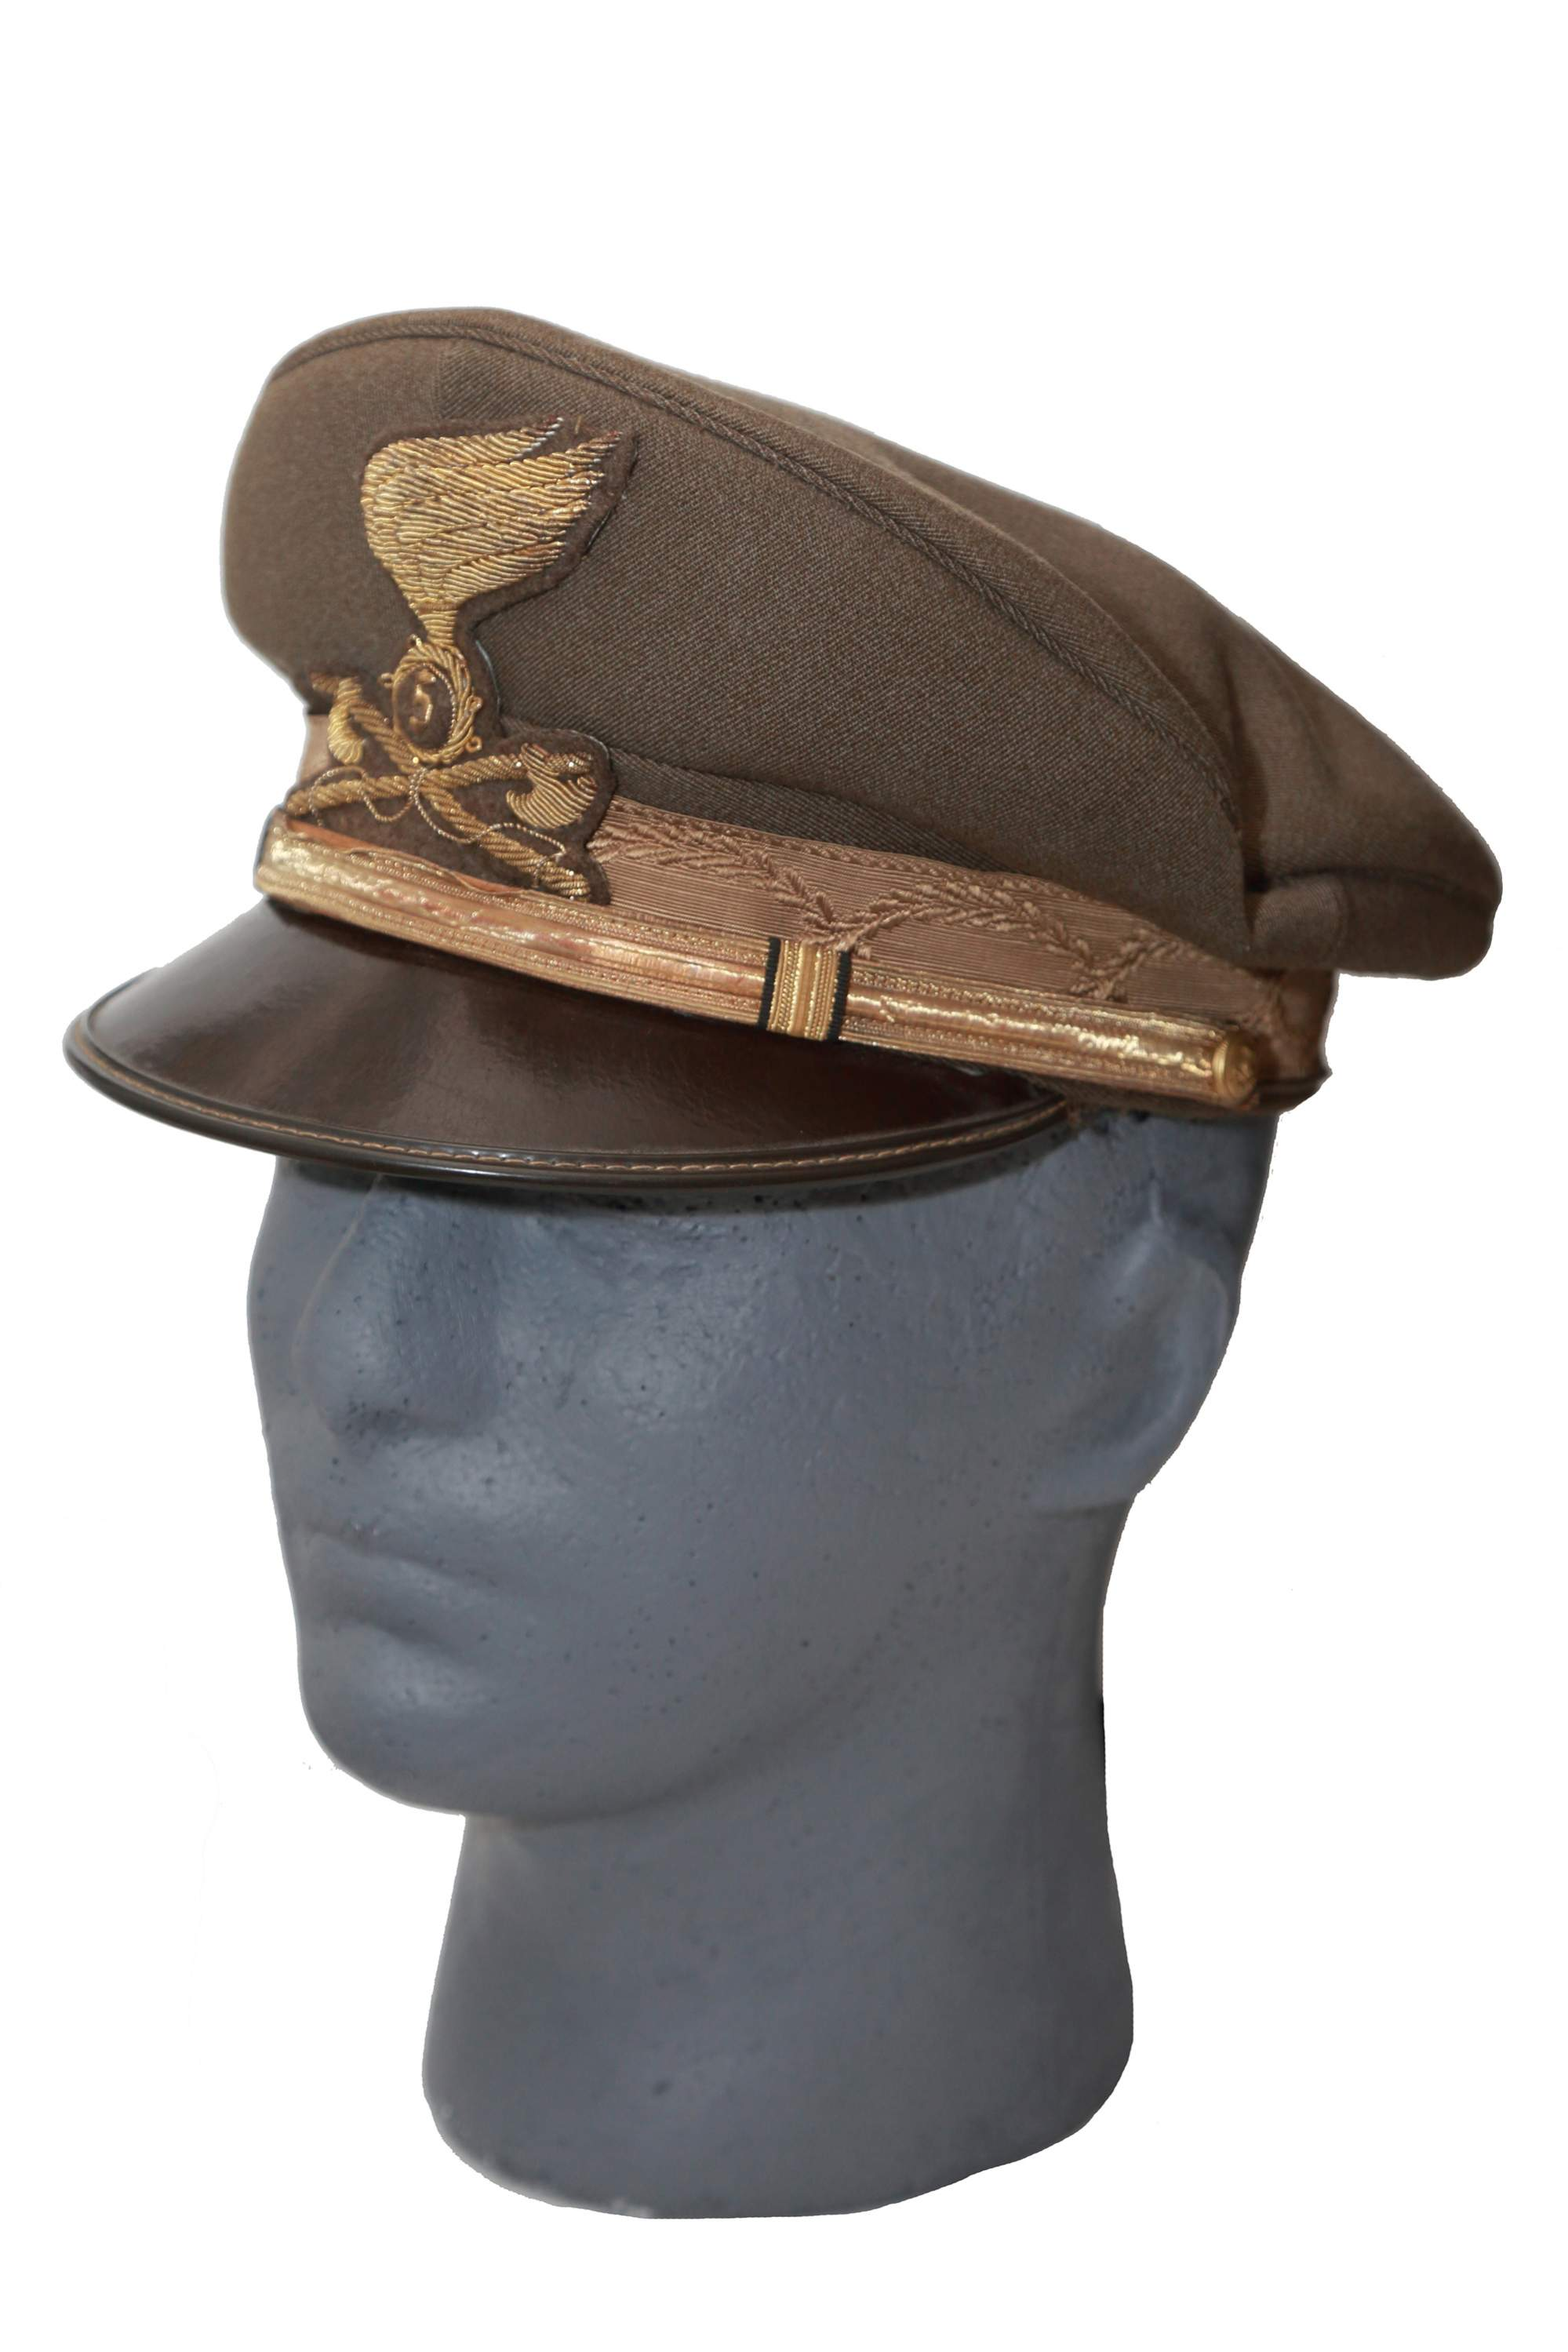 Need Help Italian Officers Cap